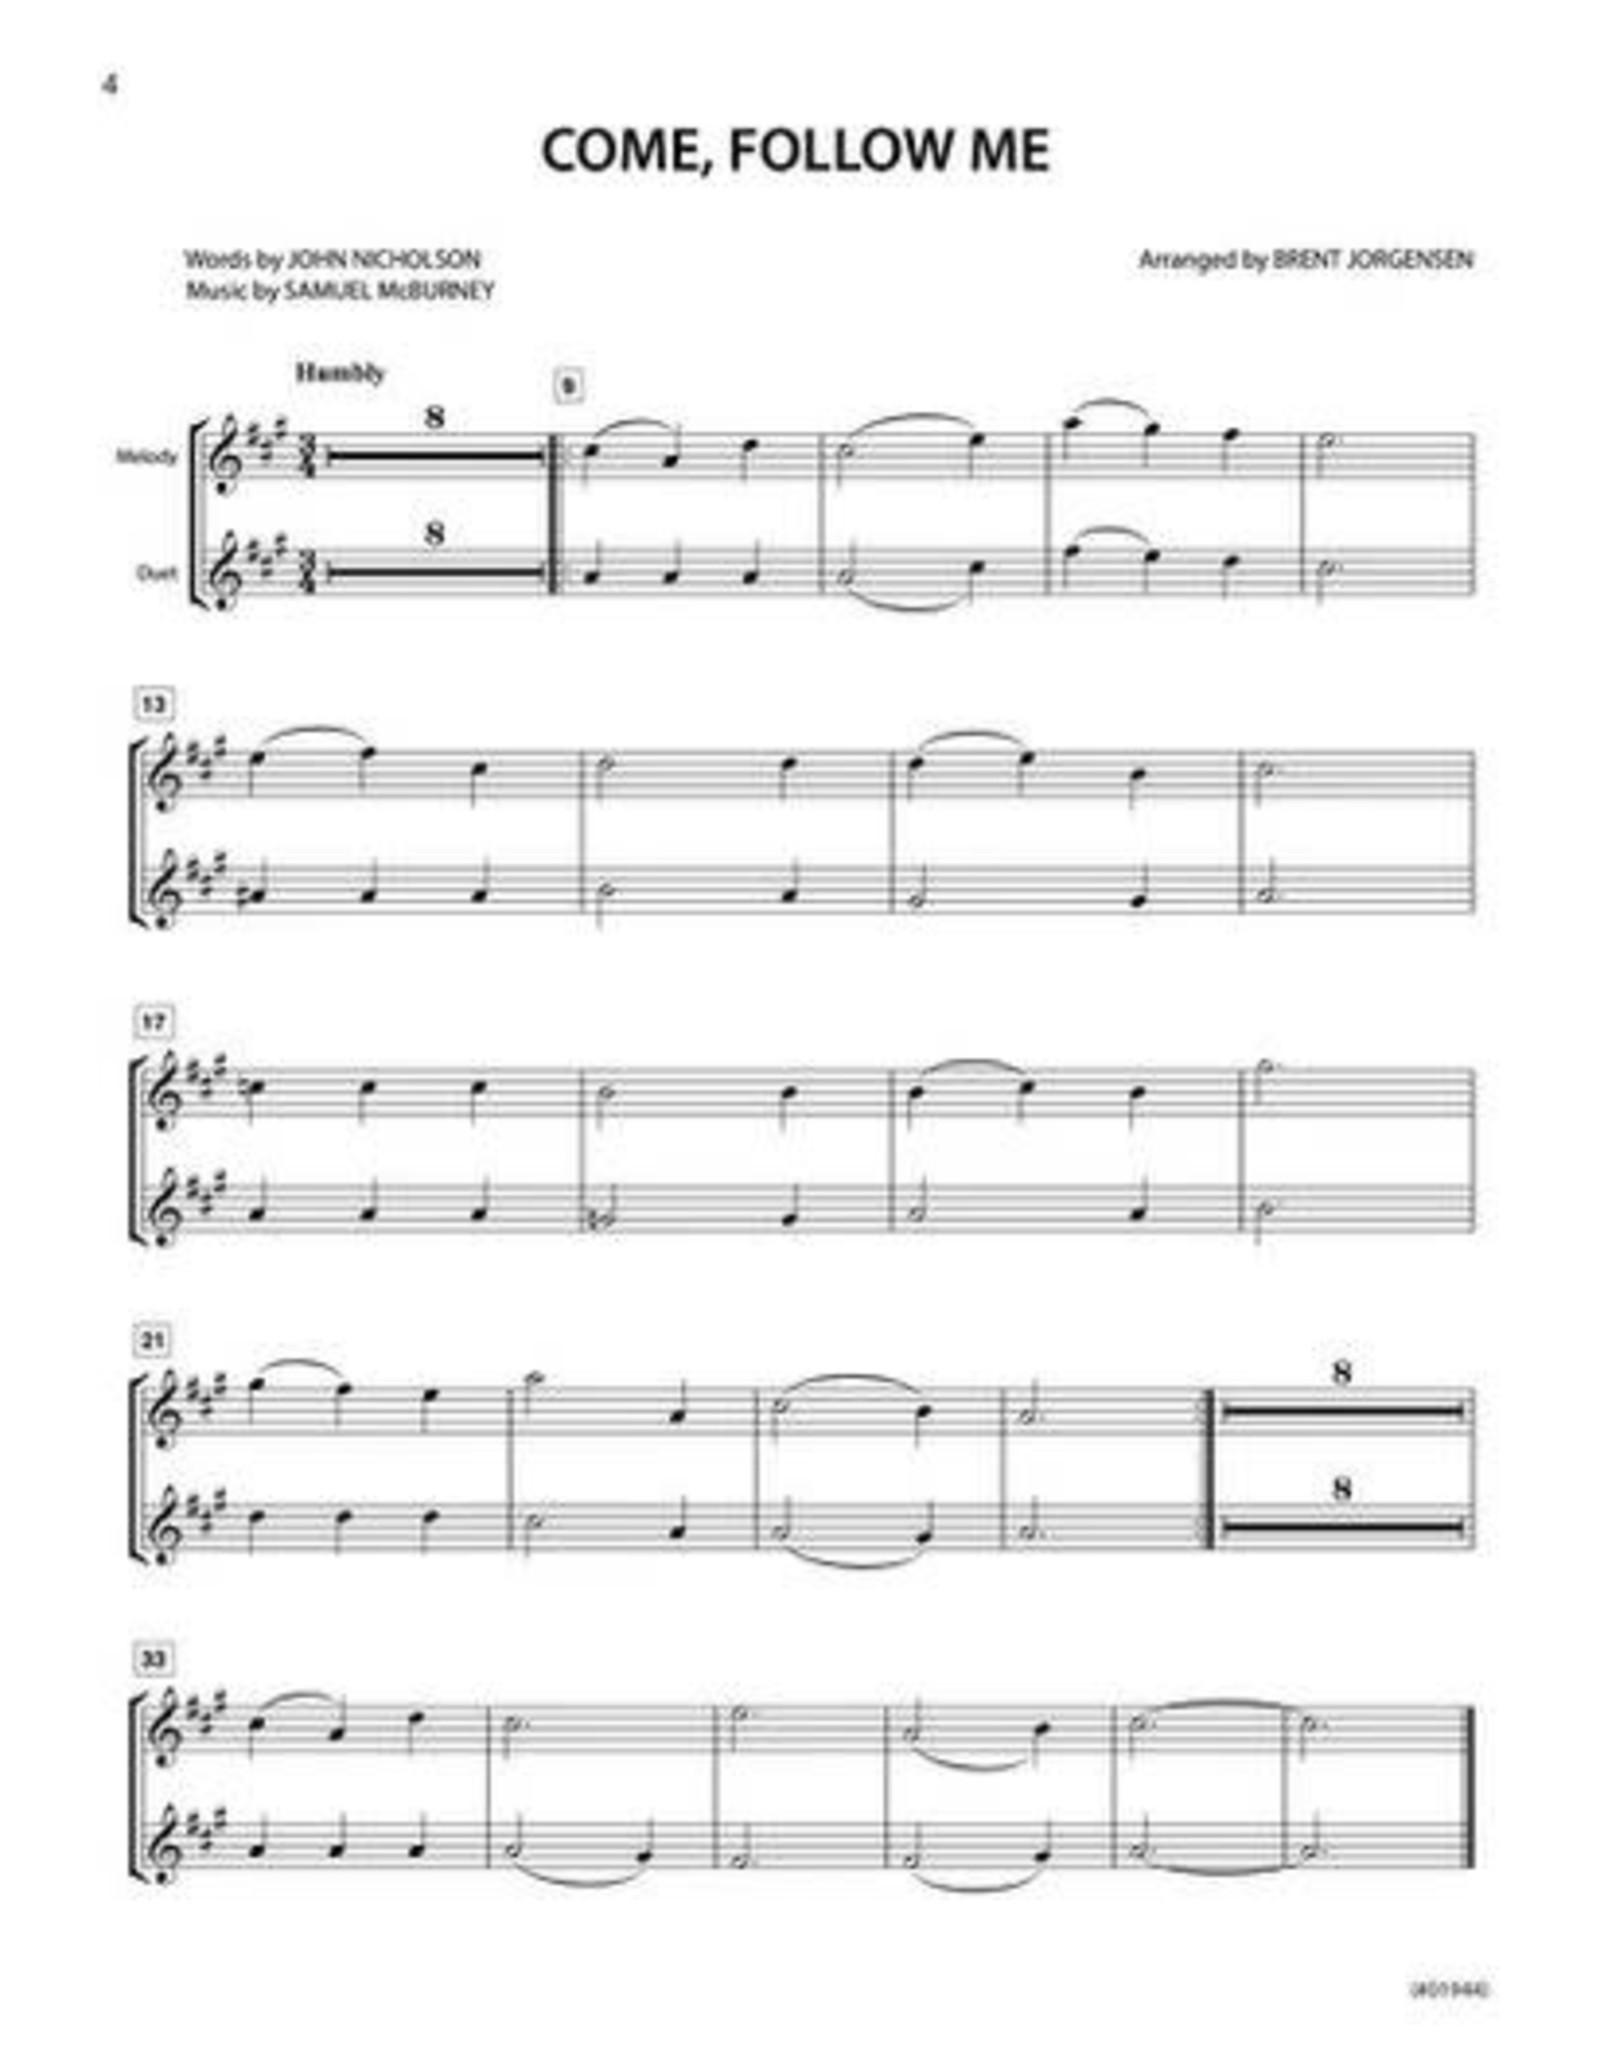 Jackman Music Hymn-Alongs Vol. 1 - arr. Brent Jorgensen - Tenor Saxophone